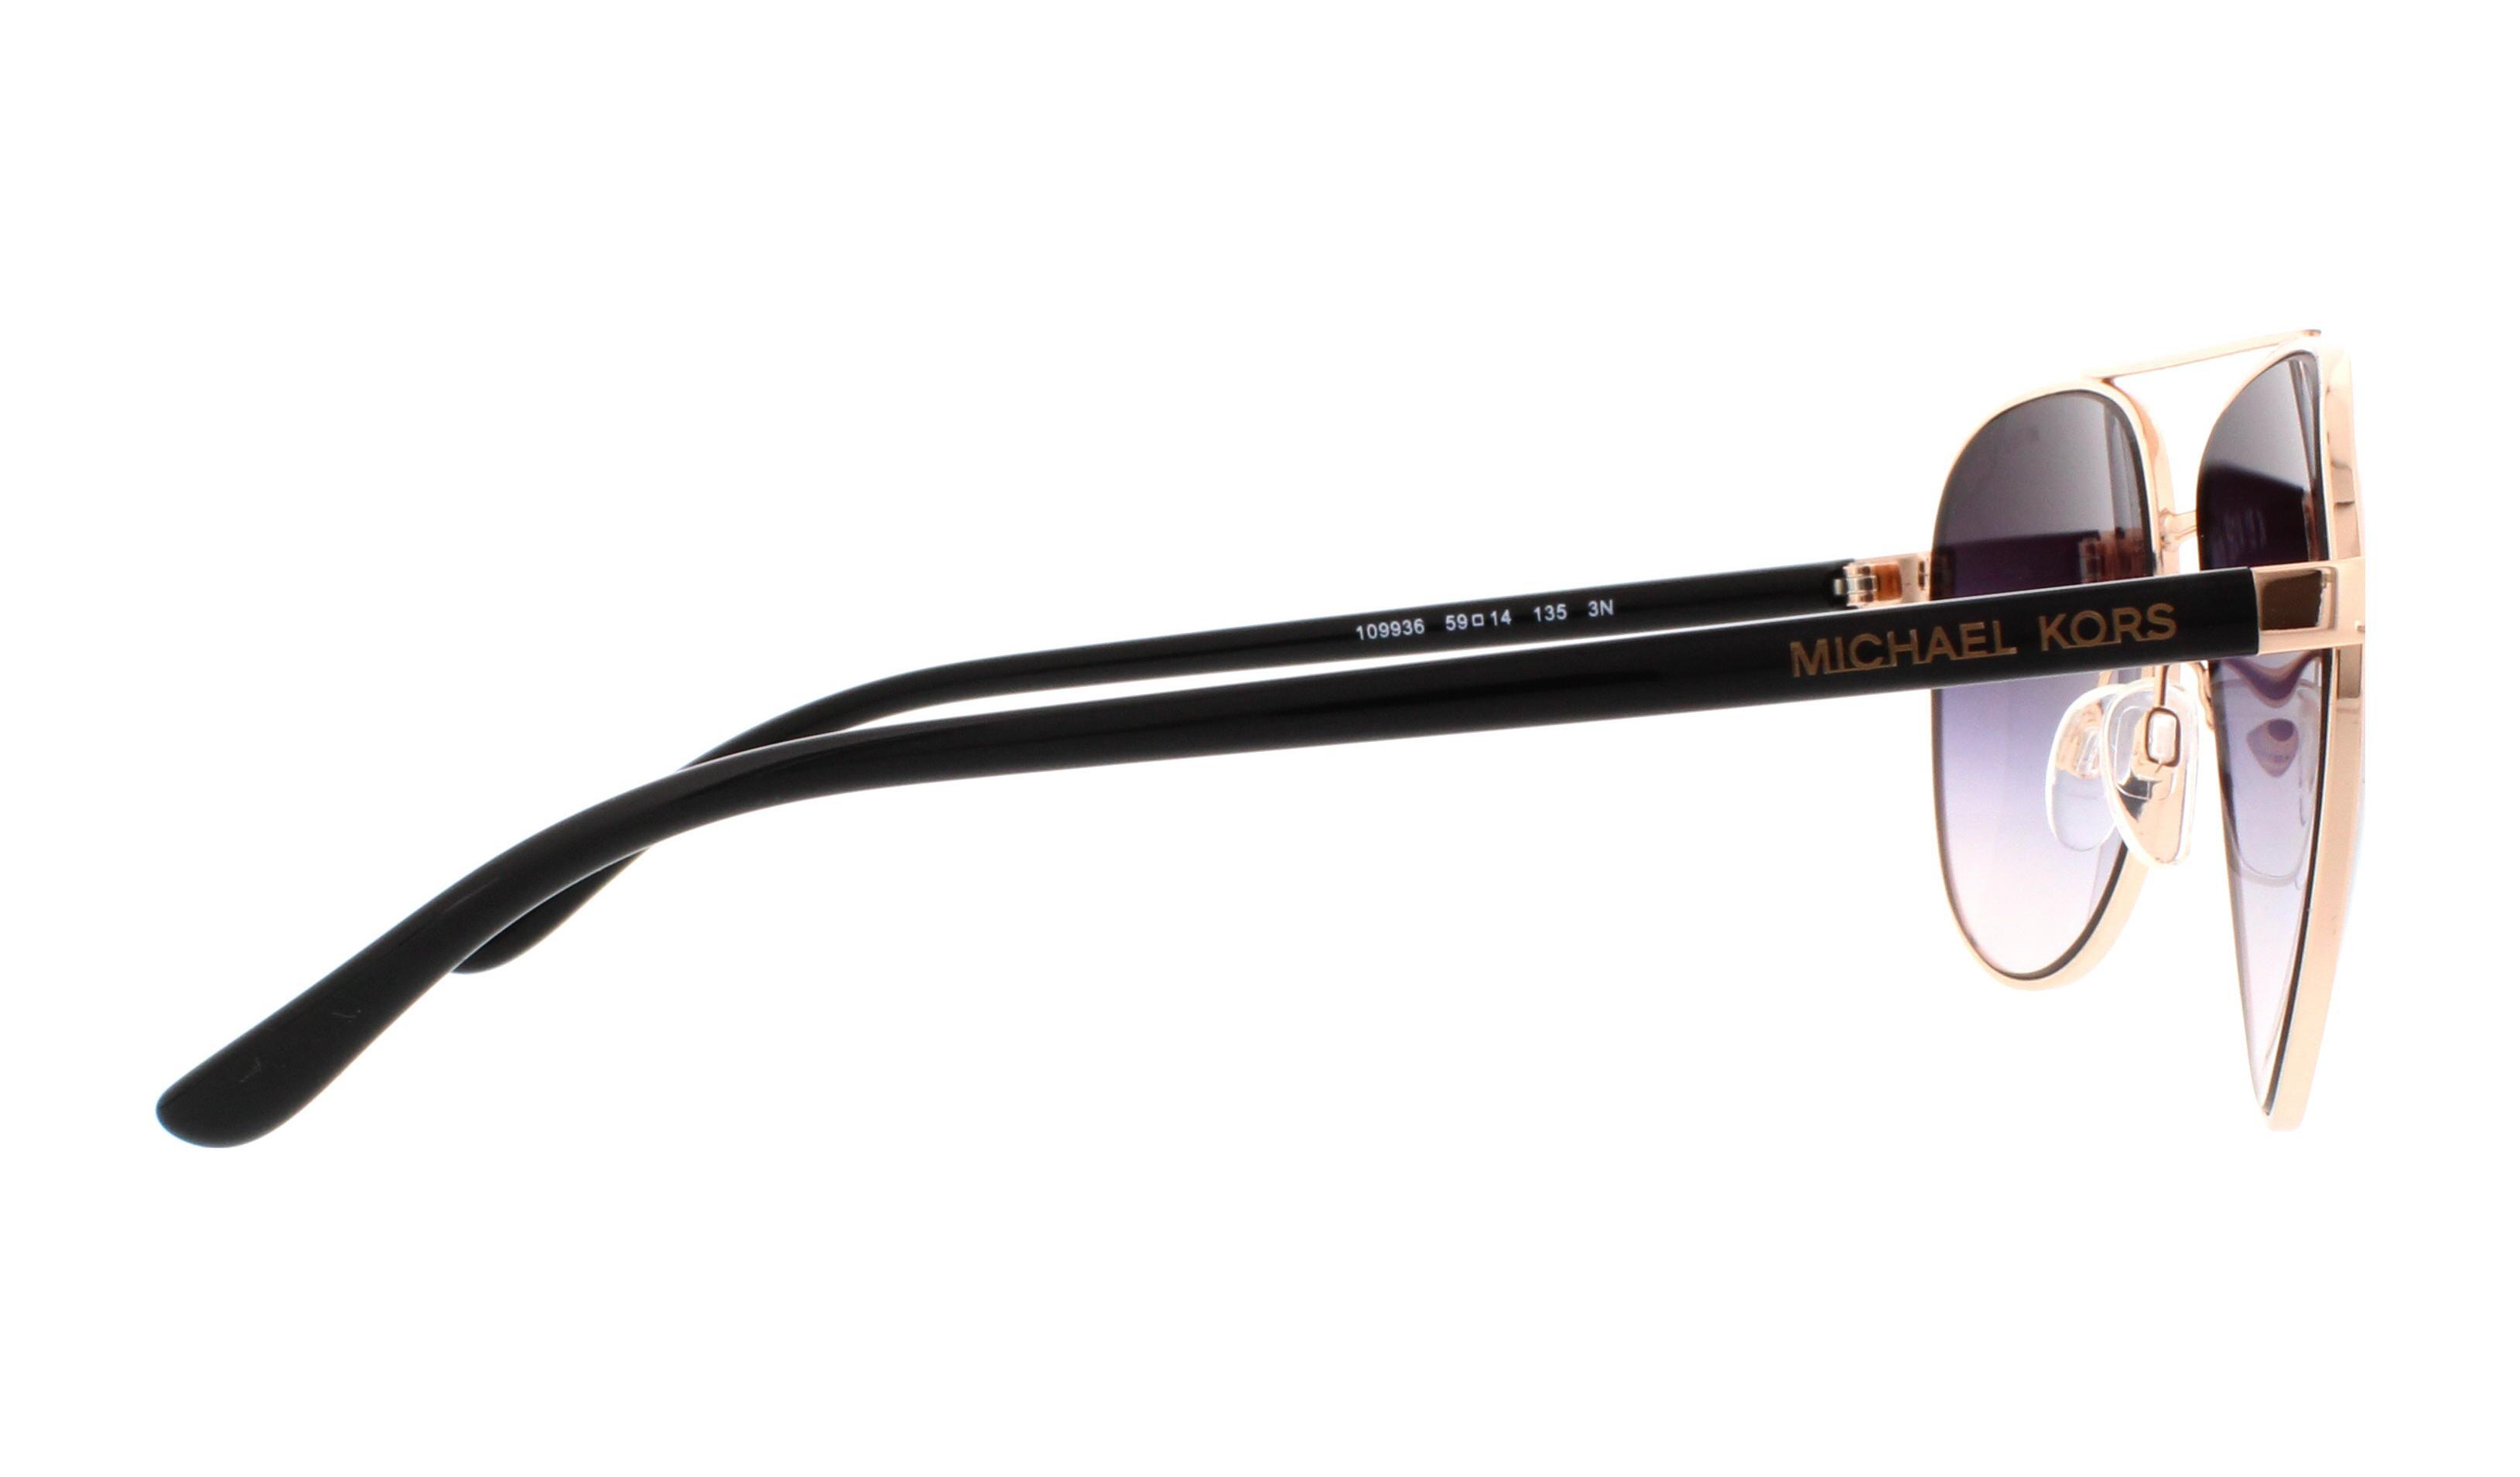 87ca77cd2f1e8 Designer Frames Outlet. Michael Kors MK5007 Hvar